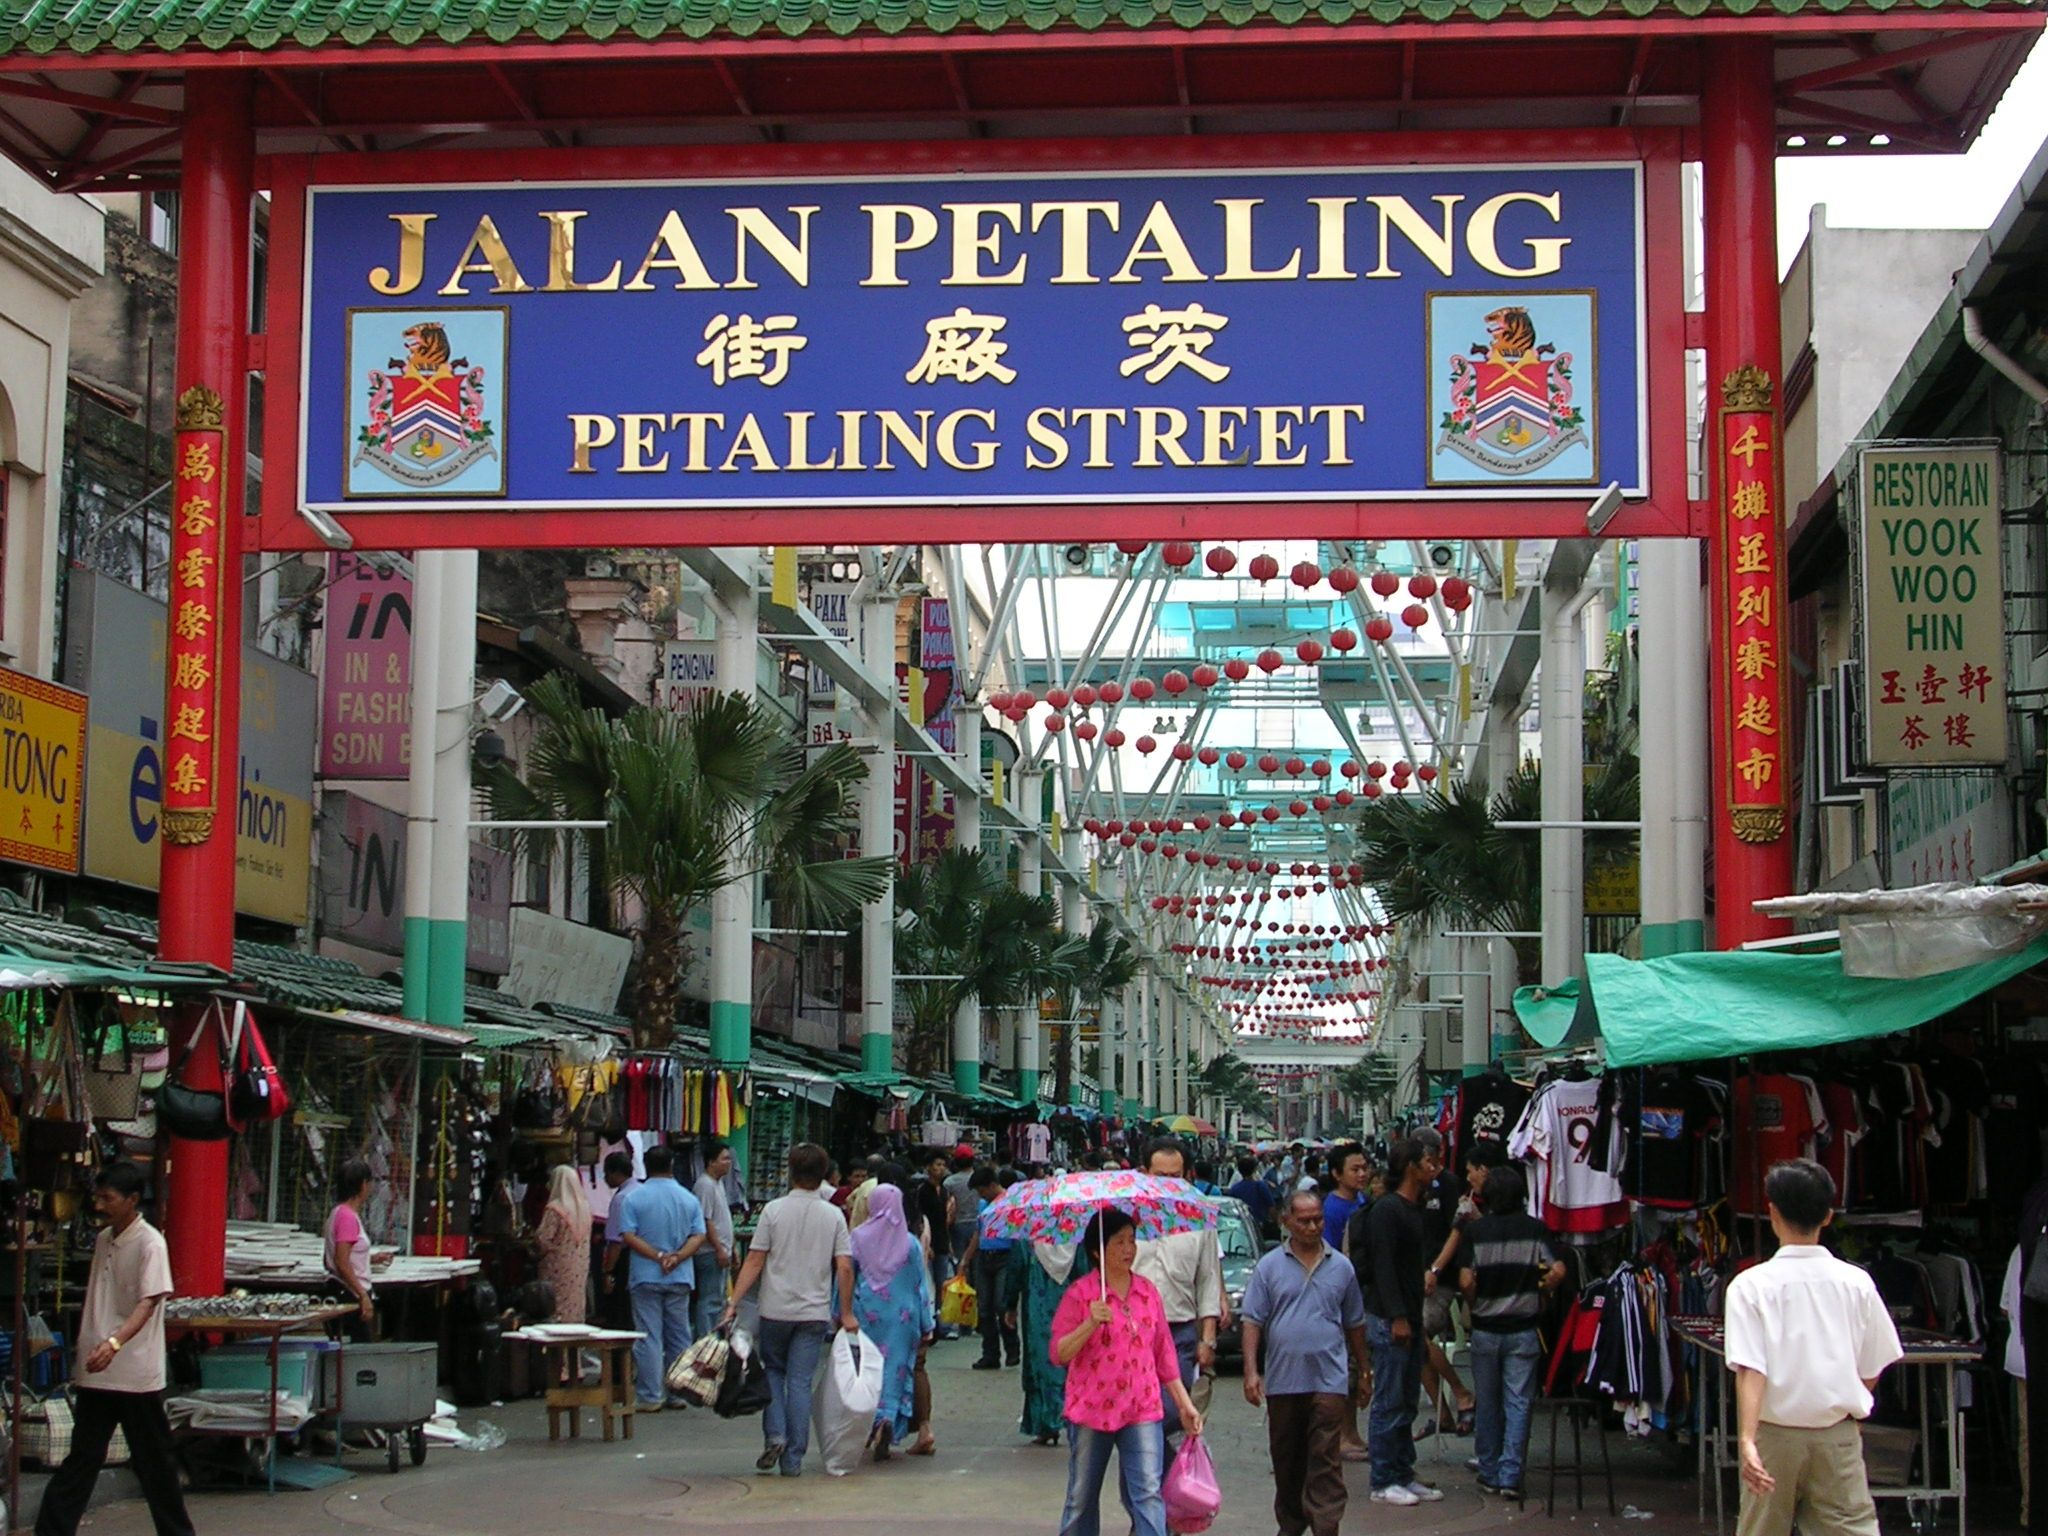 Kuala Lumpur Petaling Street With Images Kuala Lumpur Hotel